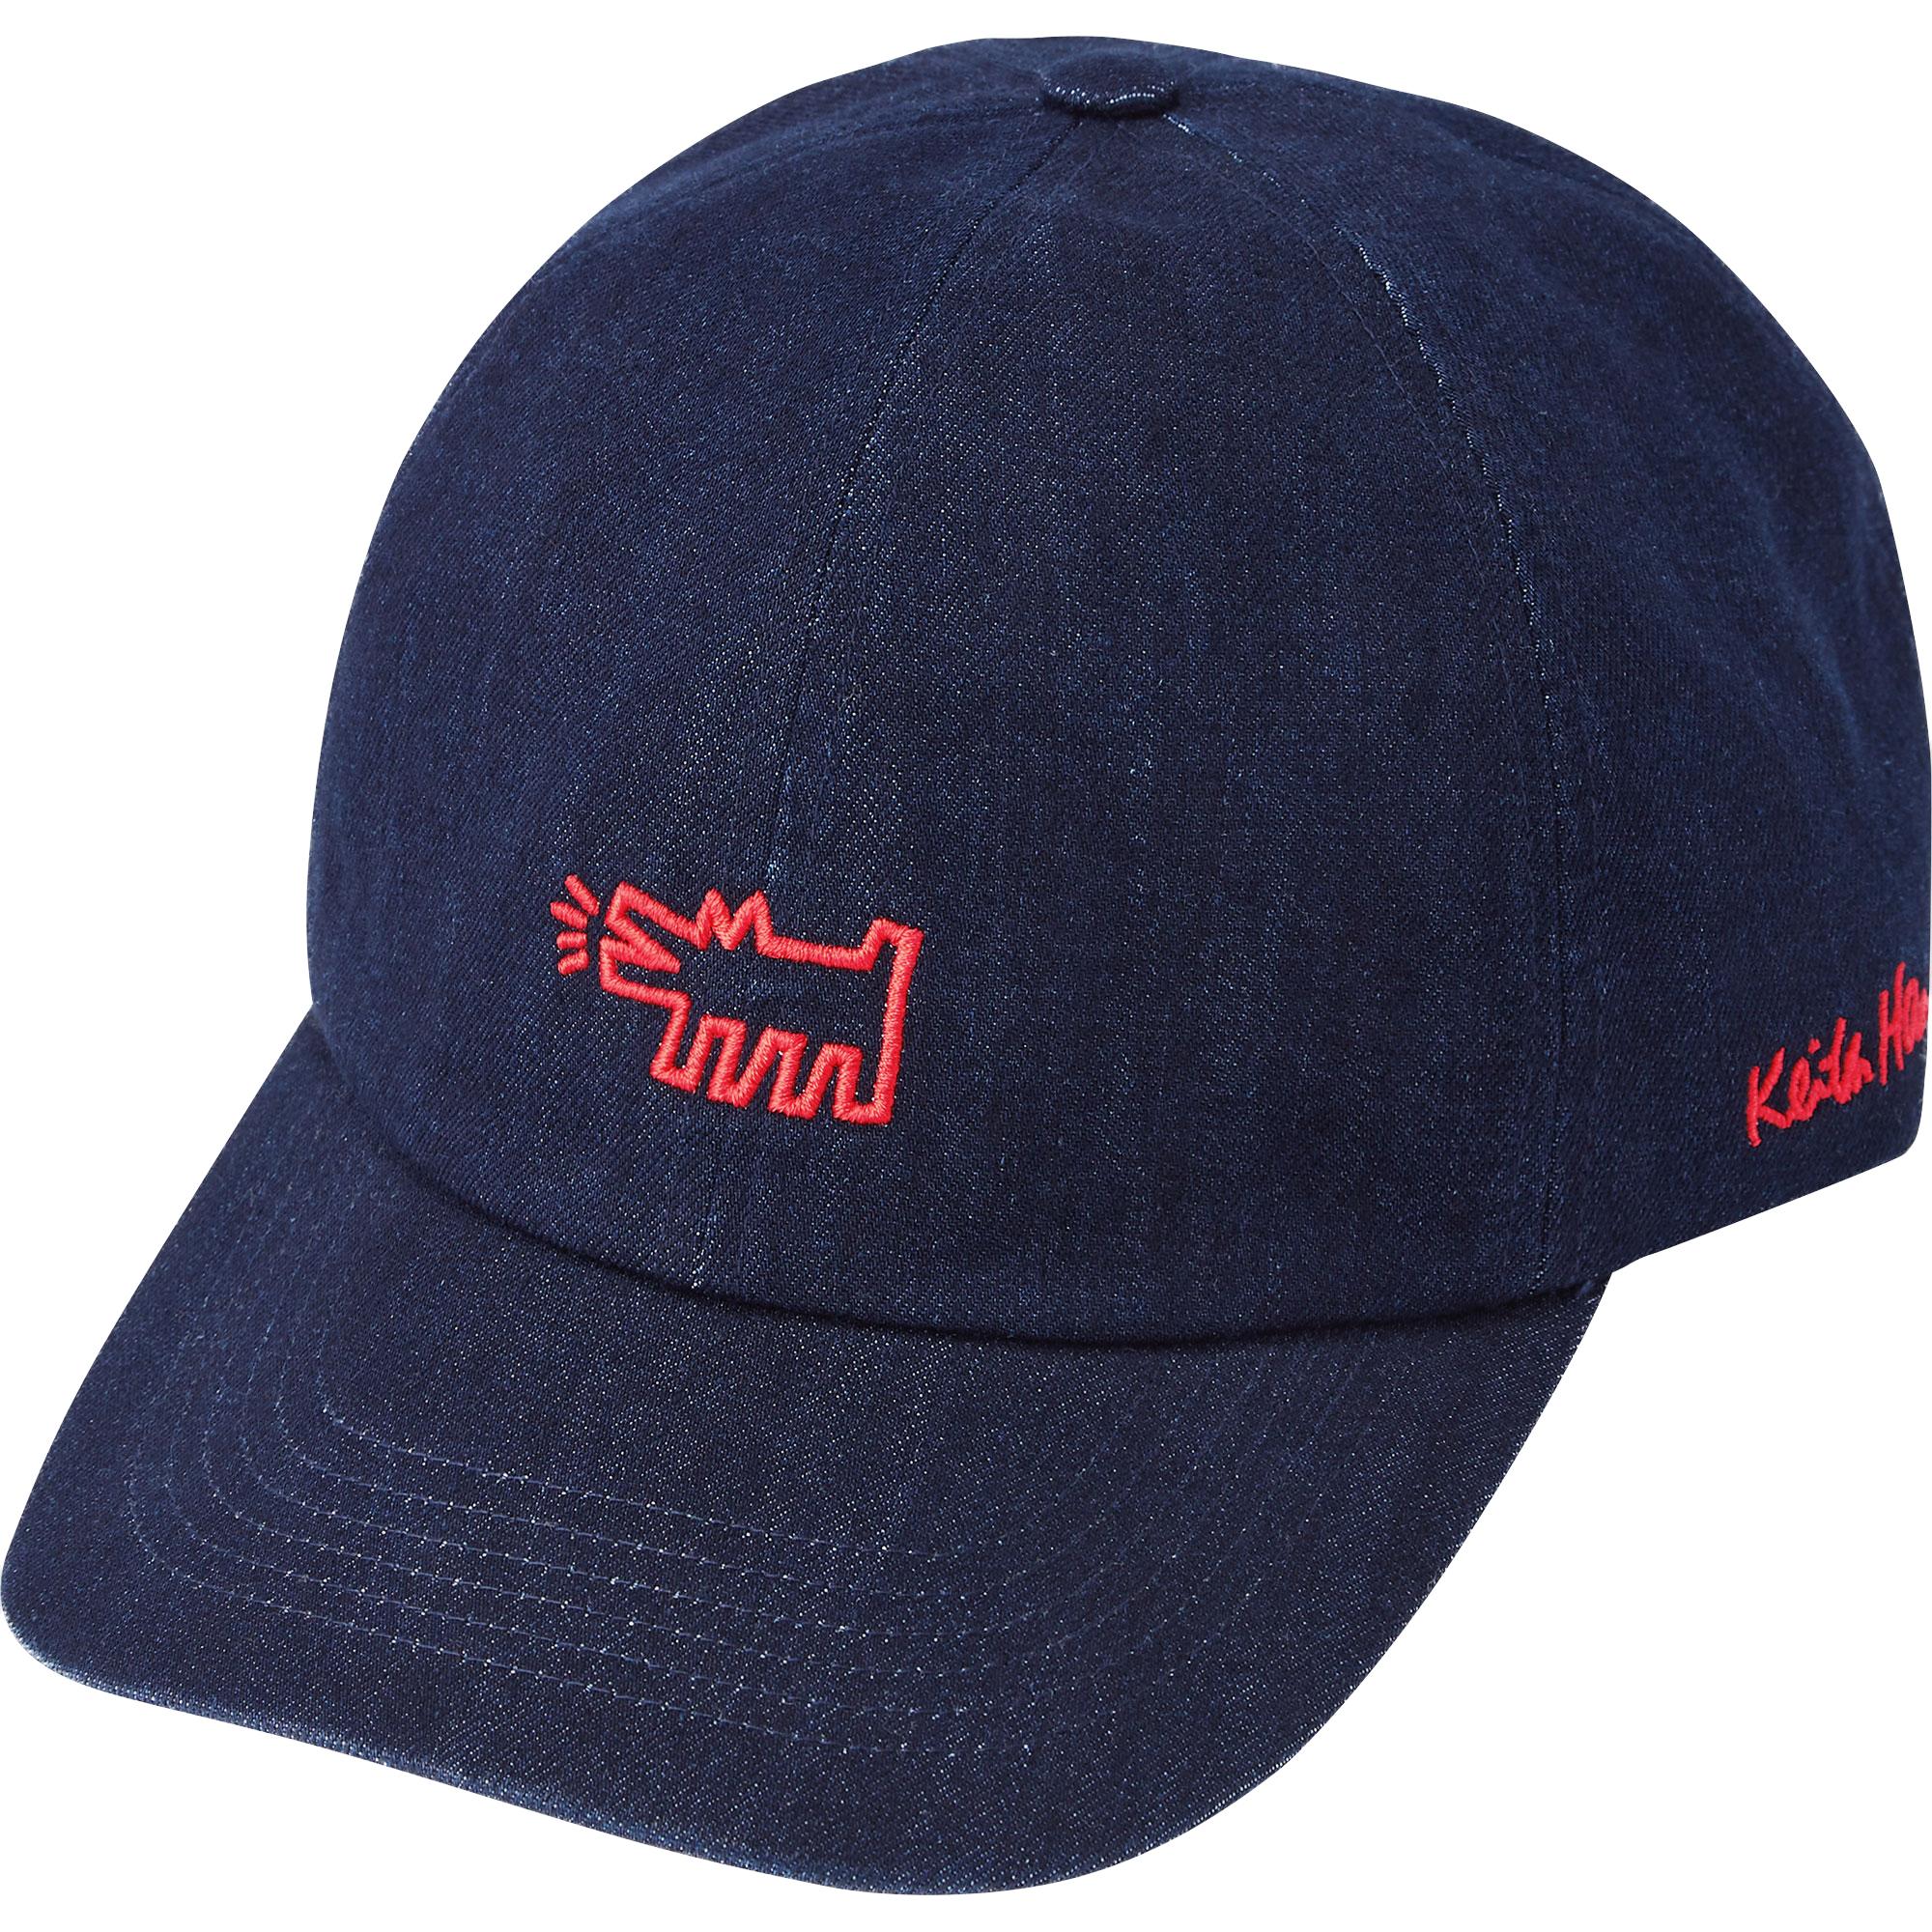 Keith Haring UV Protection Cap